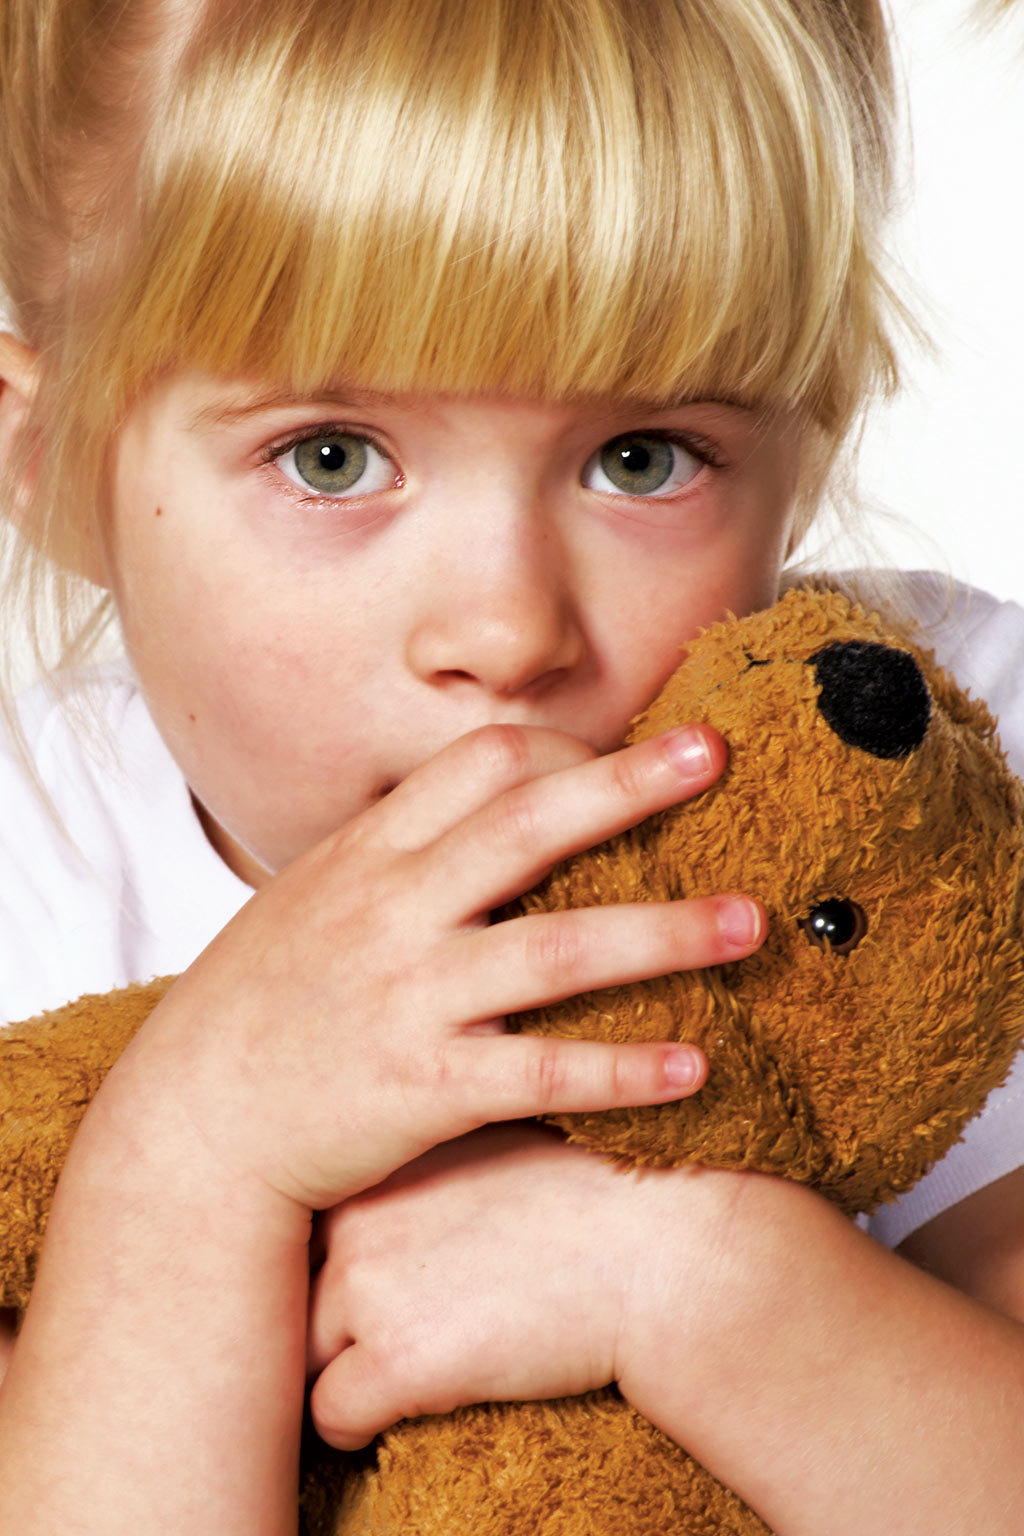 pedepse sau recompense pentru copii